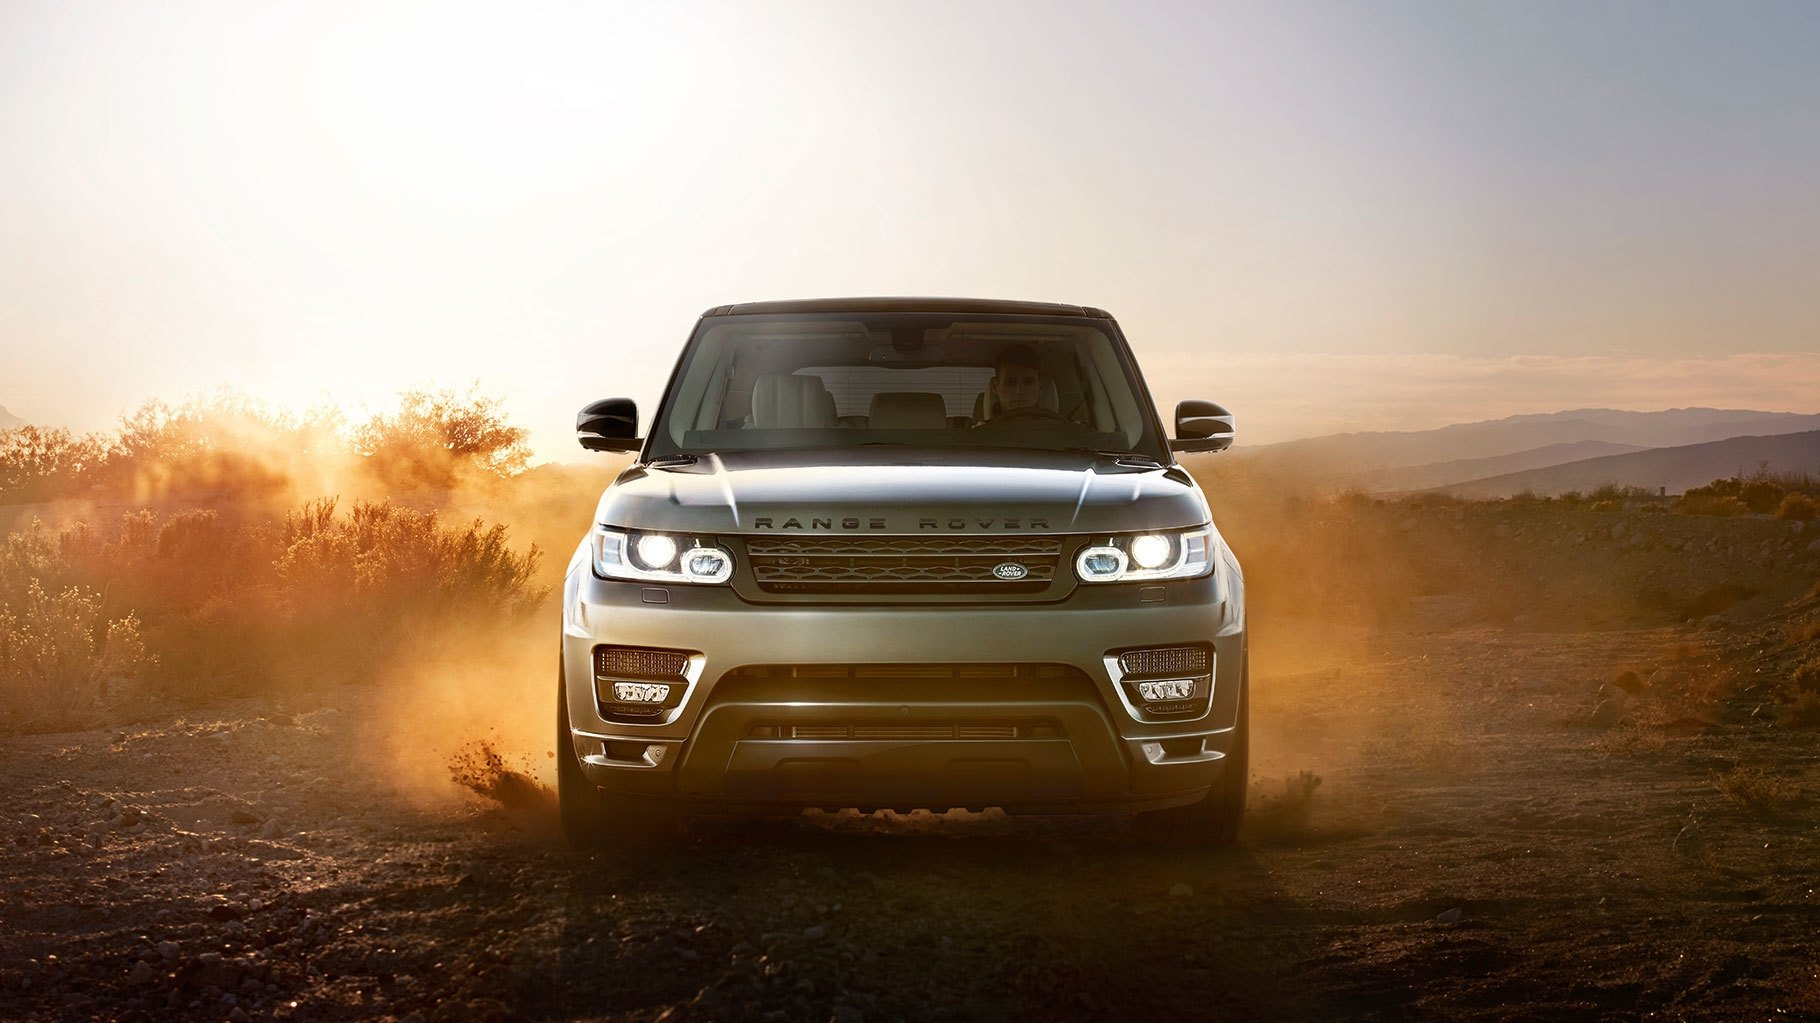 2017 Land Rover Range Rover Sport Exterior headlights